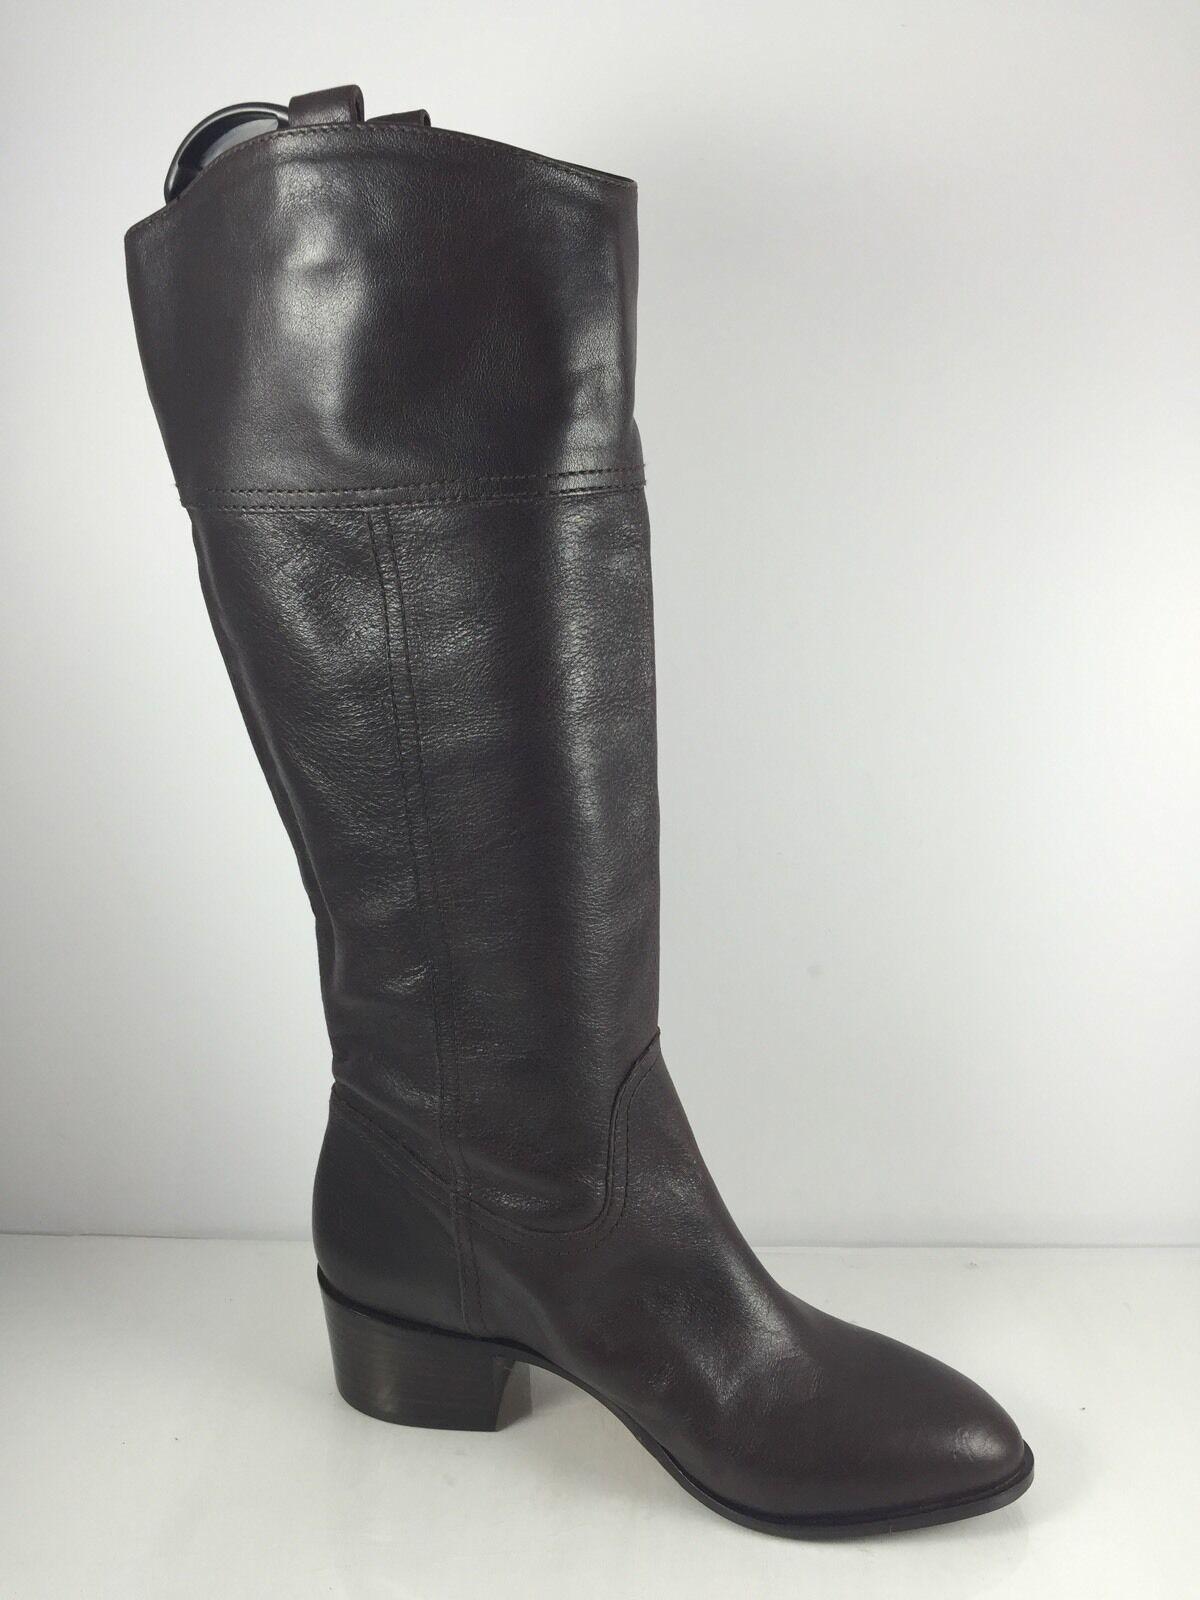 Louise Louise Louise et Cie Damenschuhe Braun Leder Stiefel 8.5 B 8dc5aa